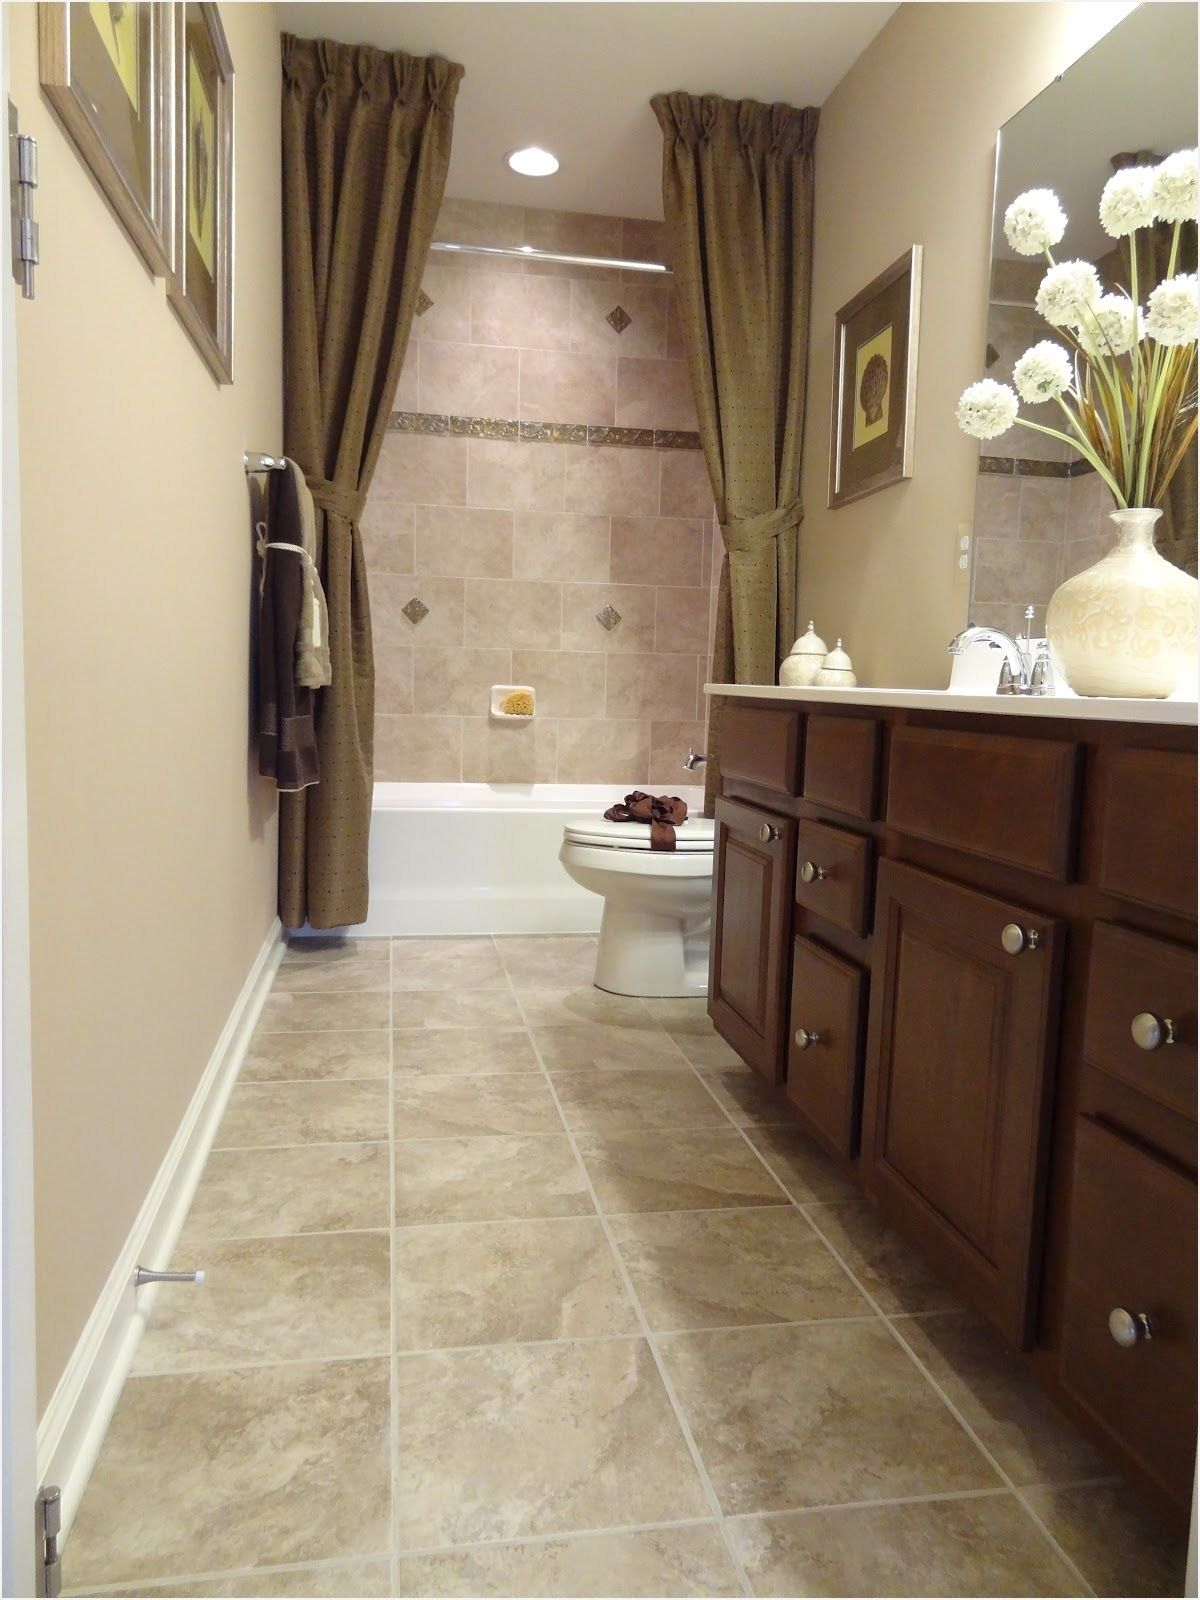 41 awesome small full bathroom remodel ideas small full on bathroom renovation ideas id=99989